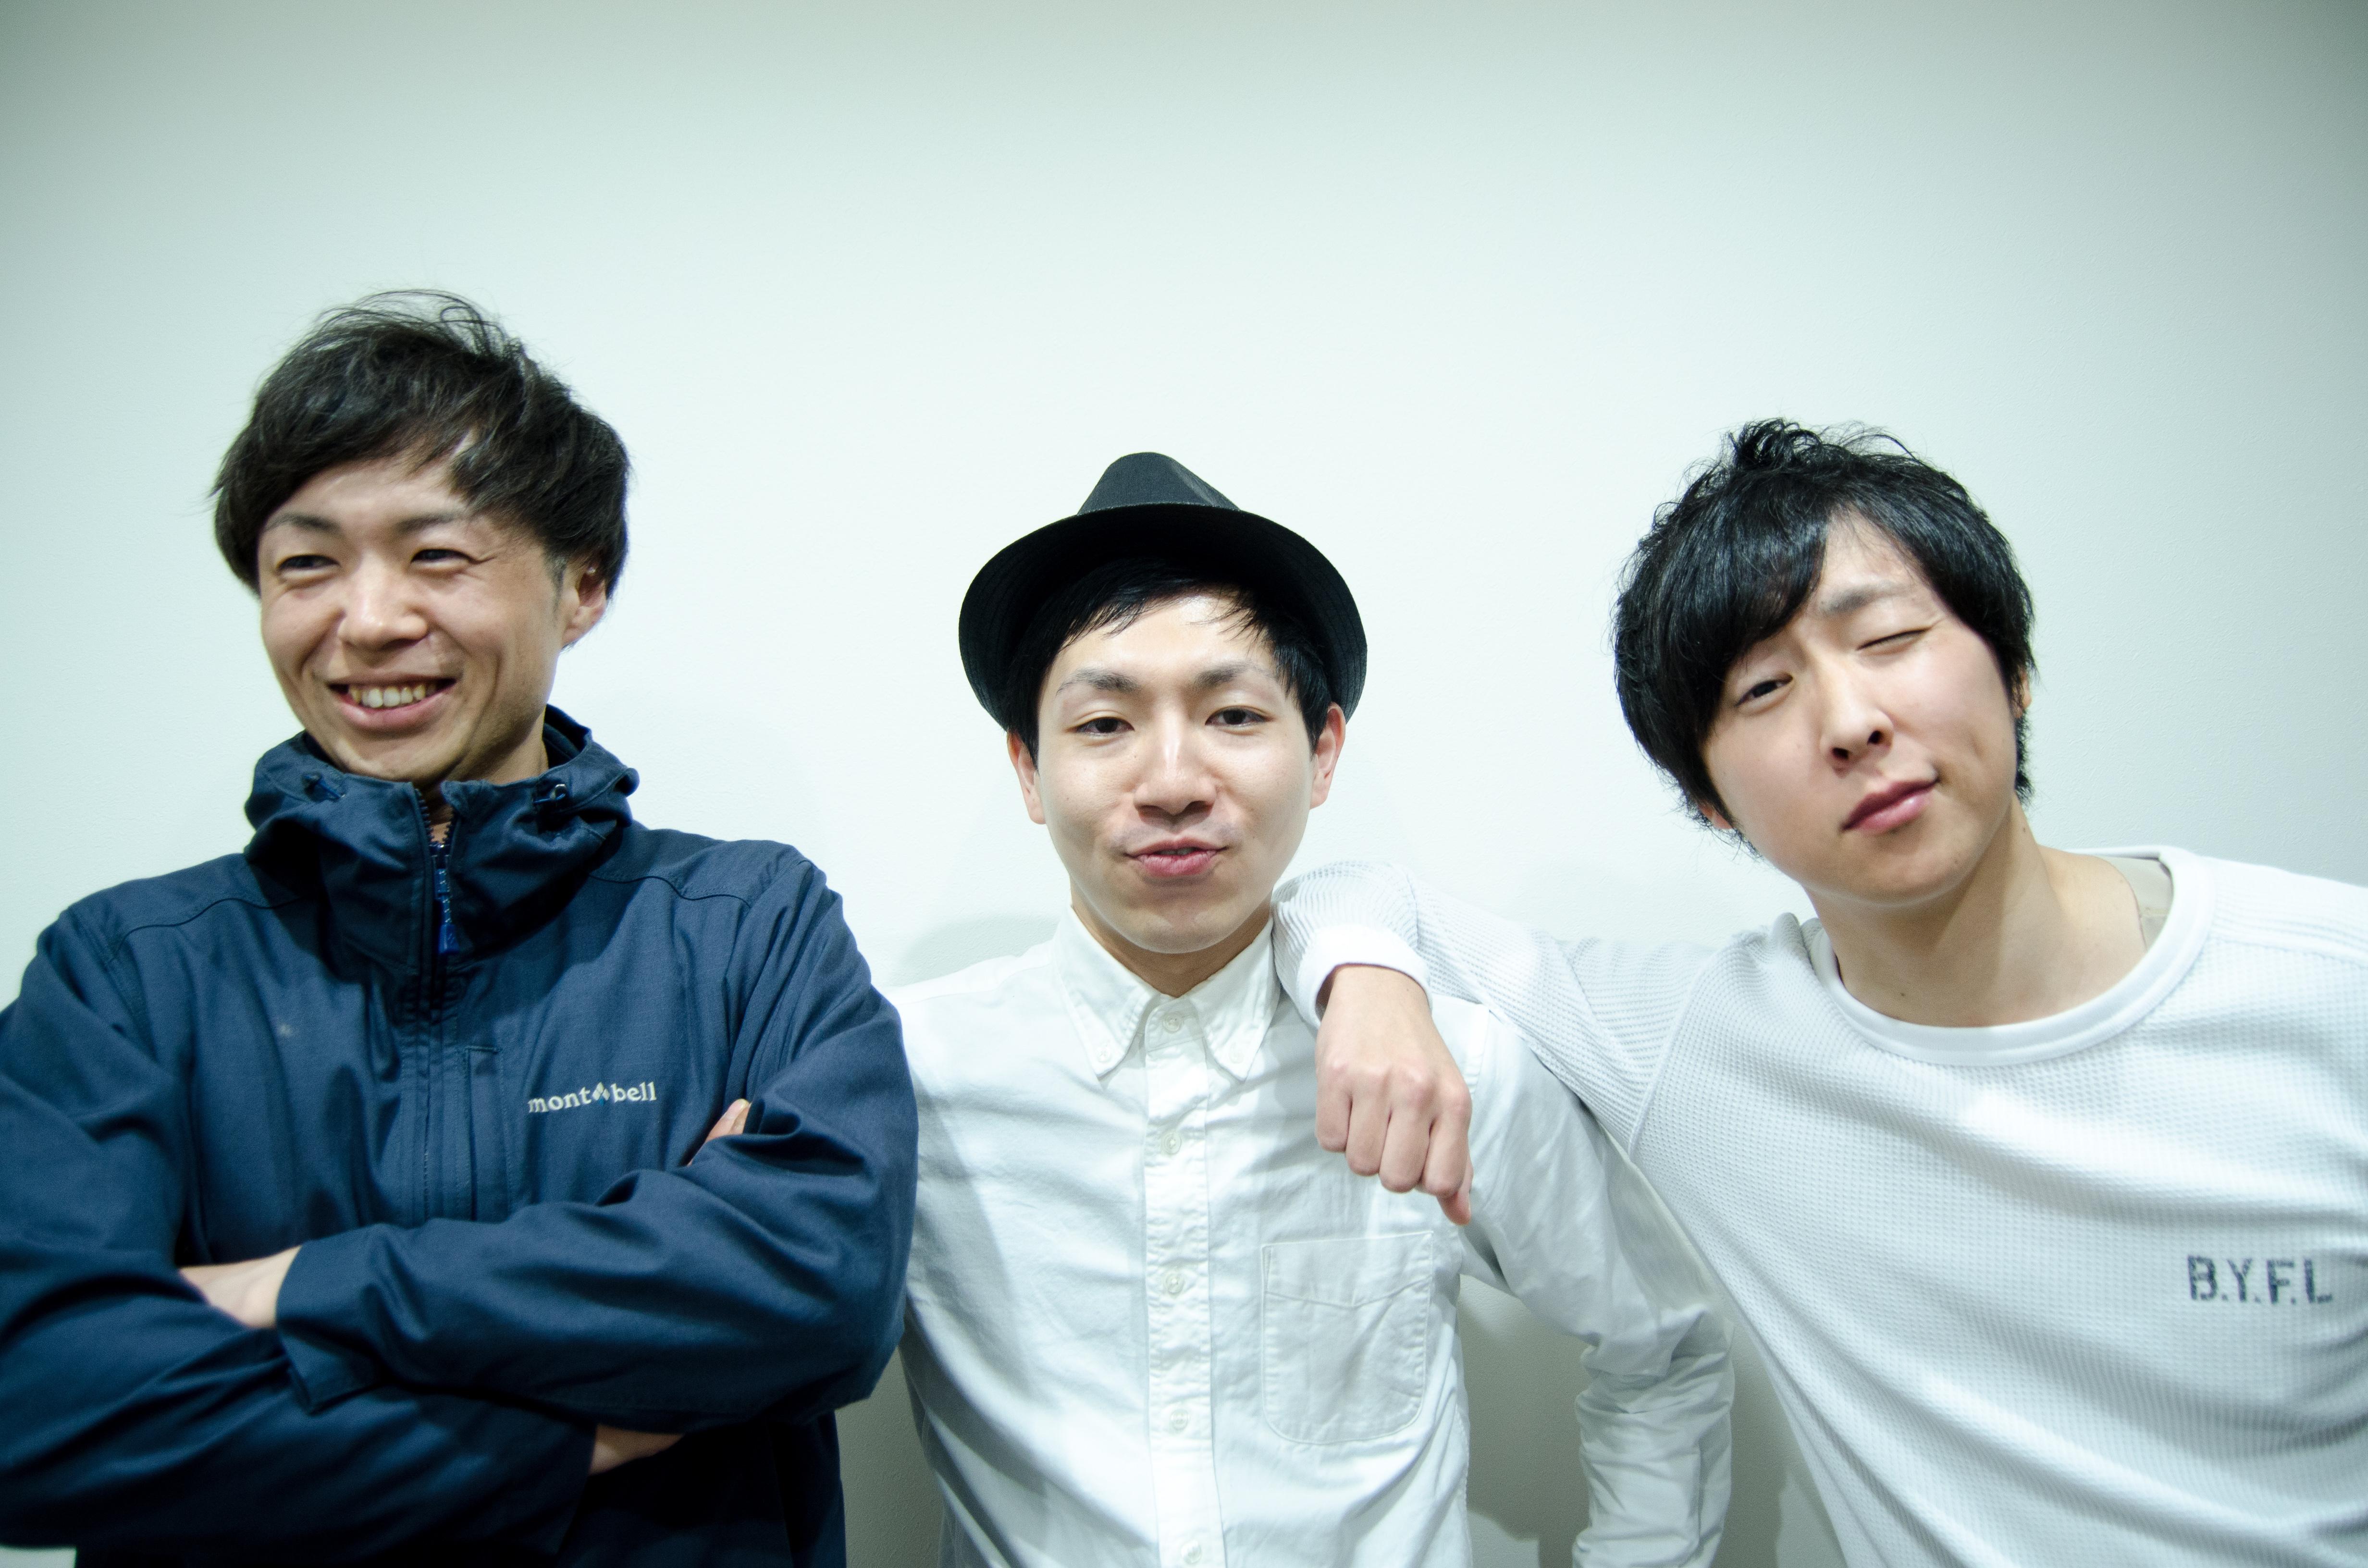 【Yo1ko2】コロナに負けない!新作のアルバムを作ってみんなに届けたい!!